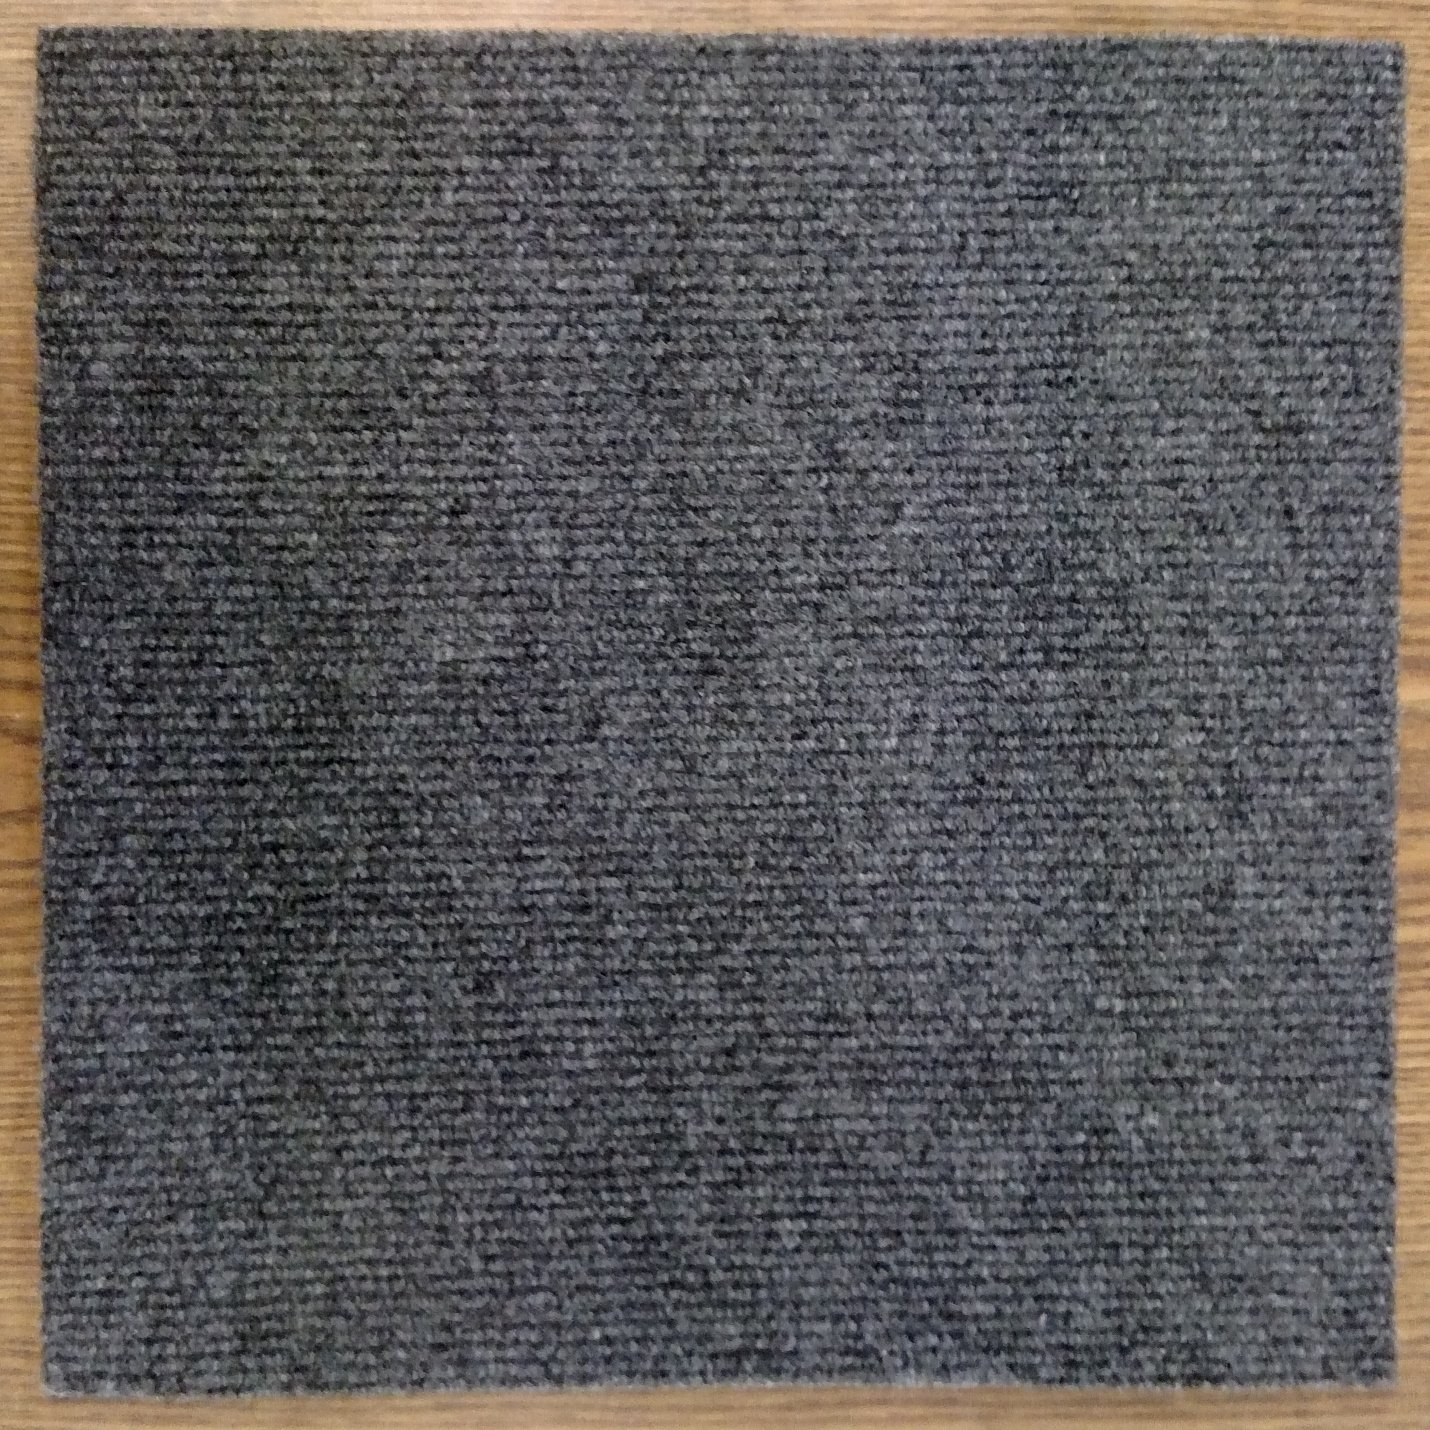 Carpet Tiles Self Stick 12'' (72 Sq. Ft.) Charcoal Gray